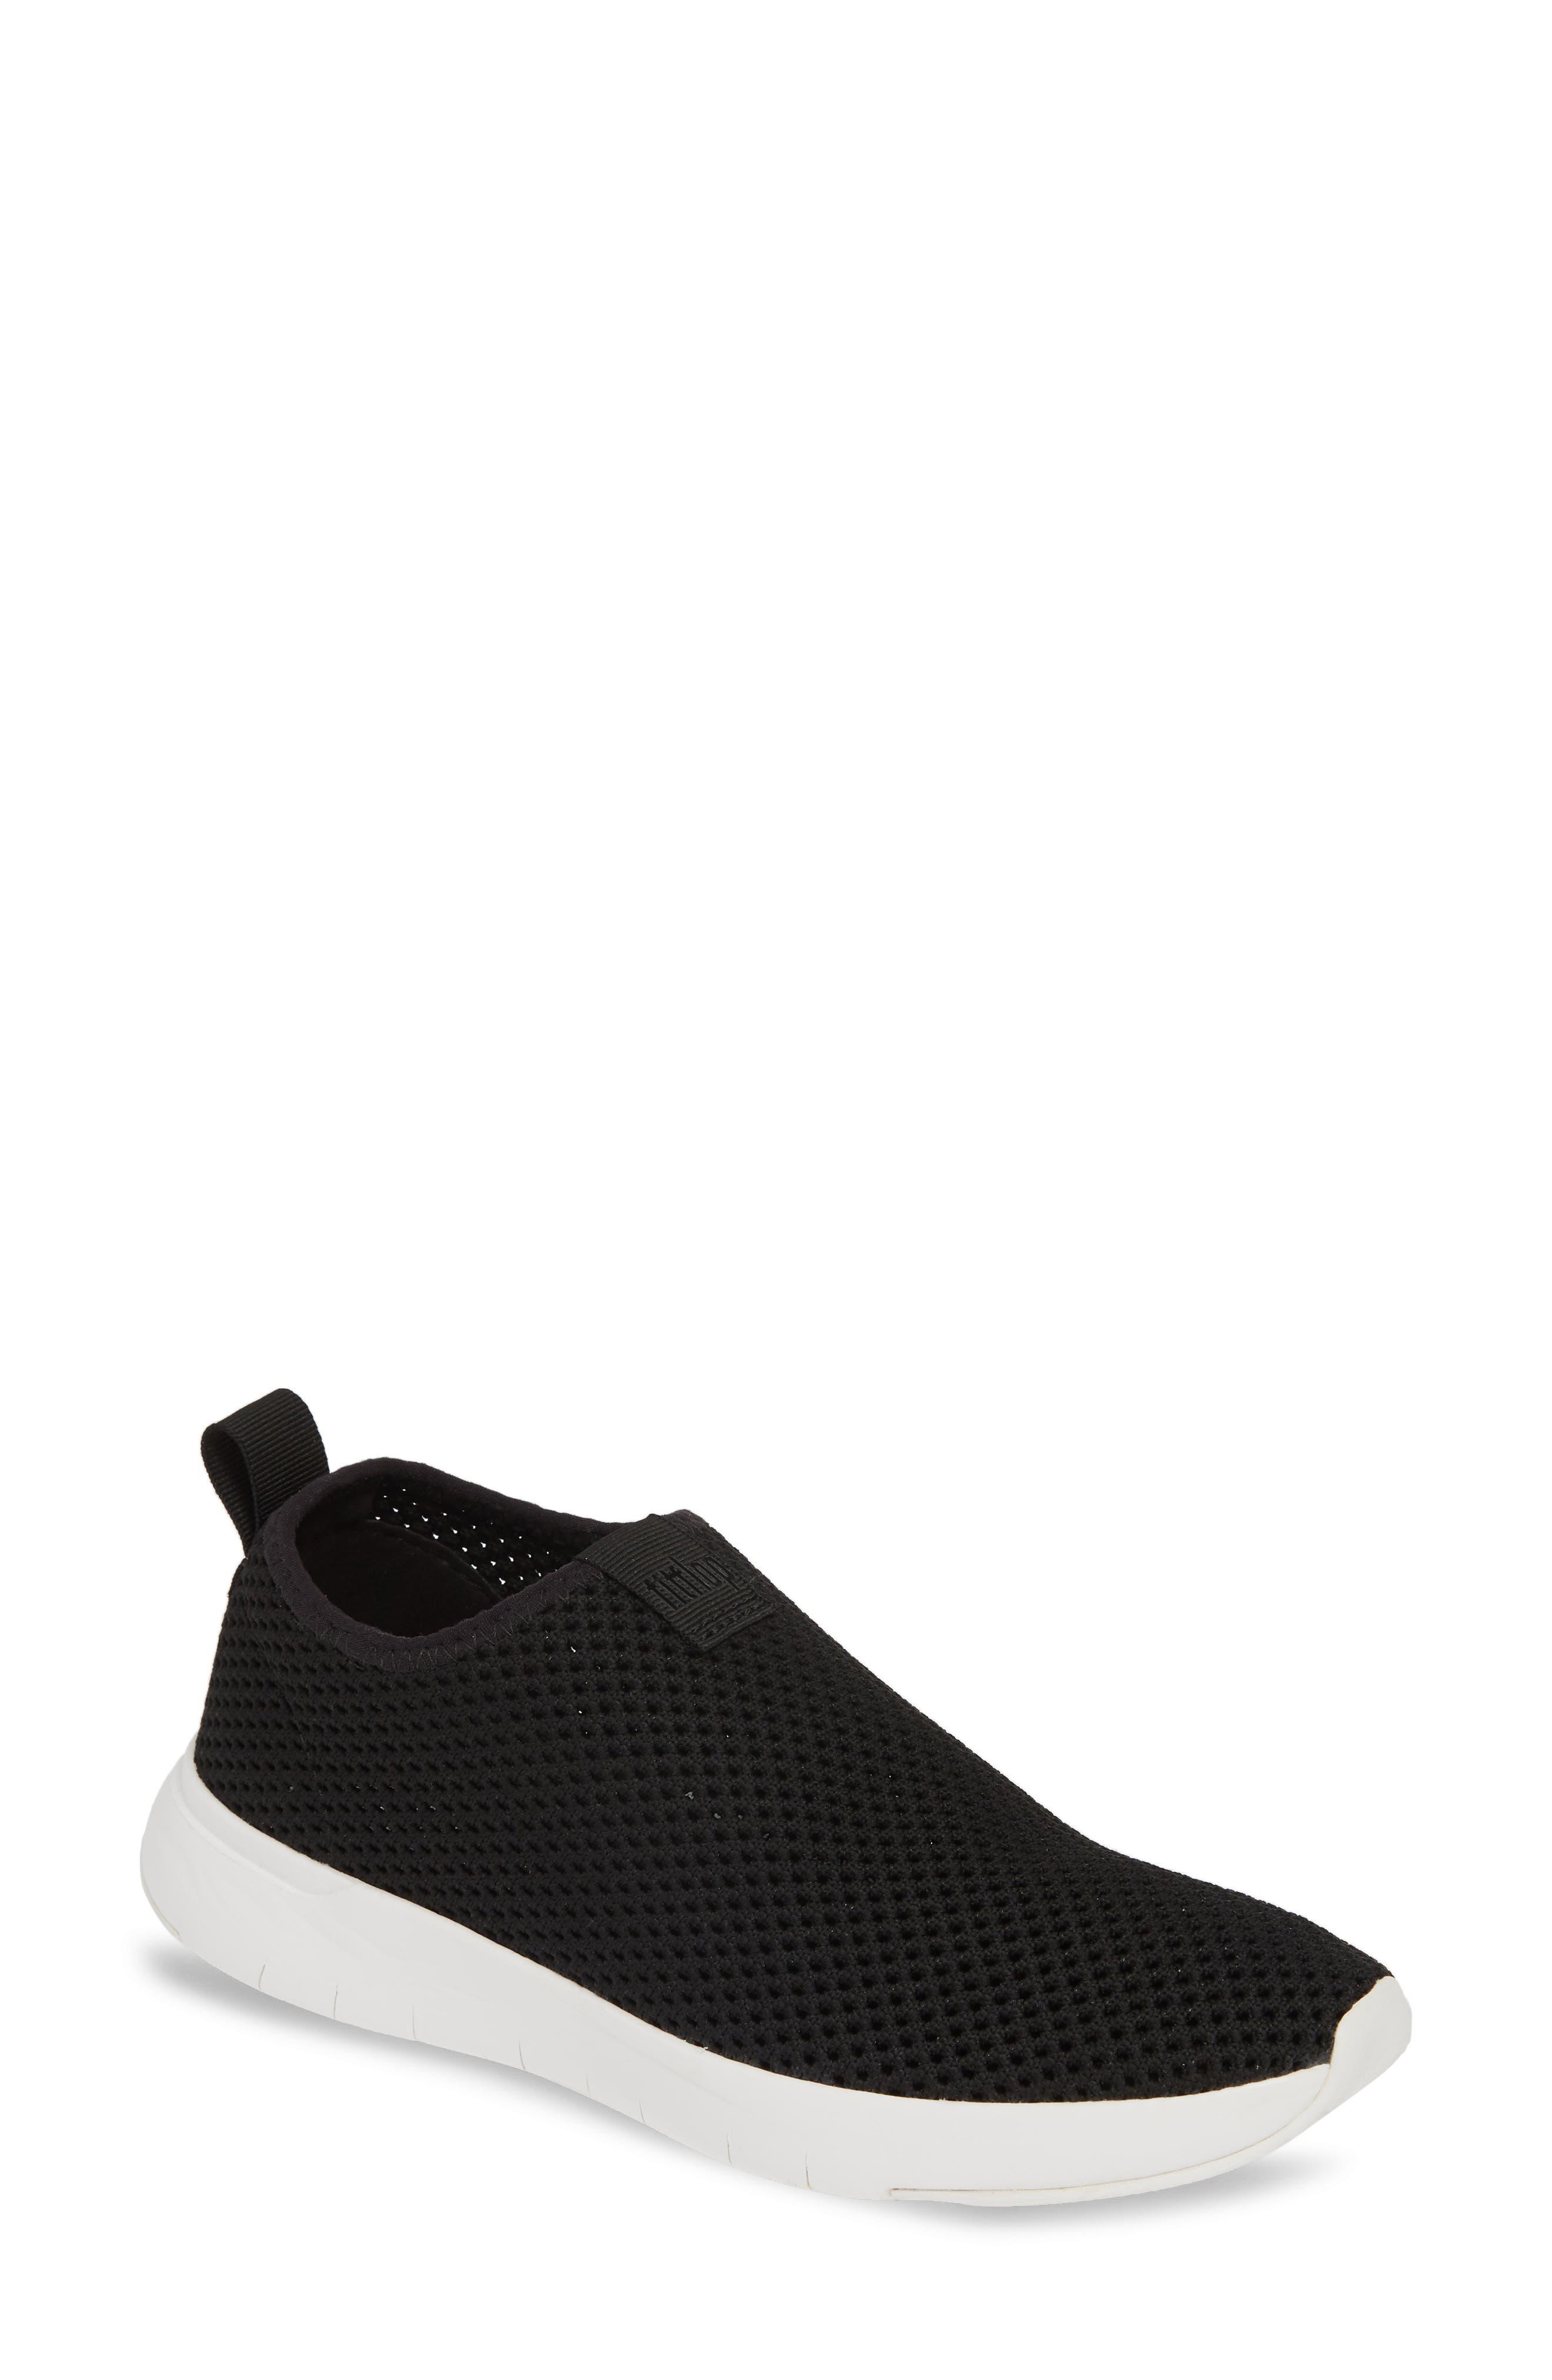 FITFLOP Airmesh Slip-On Sneaker, Main, color, BLACK